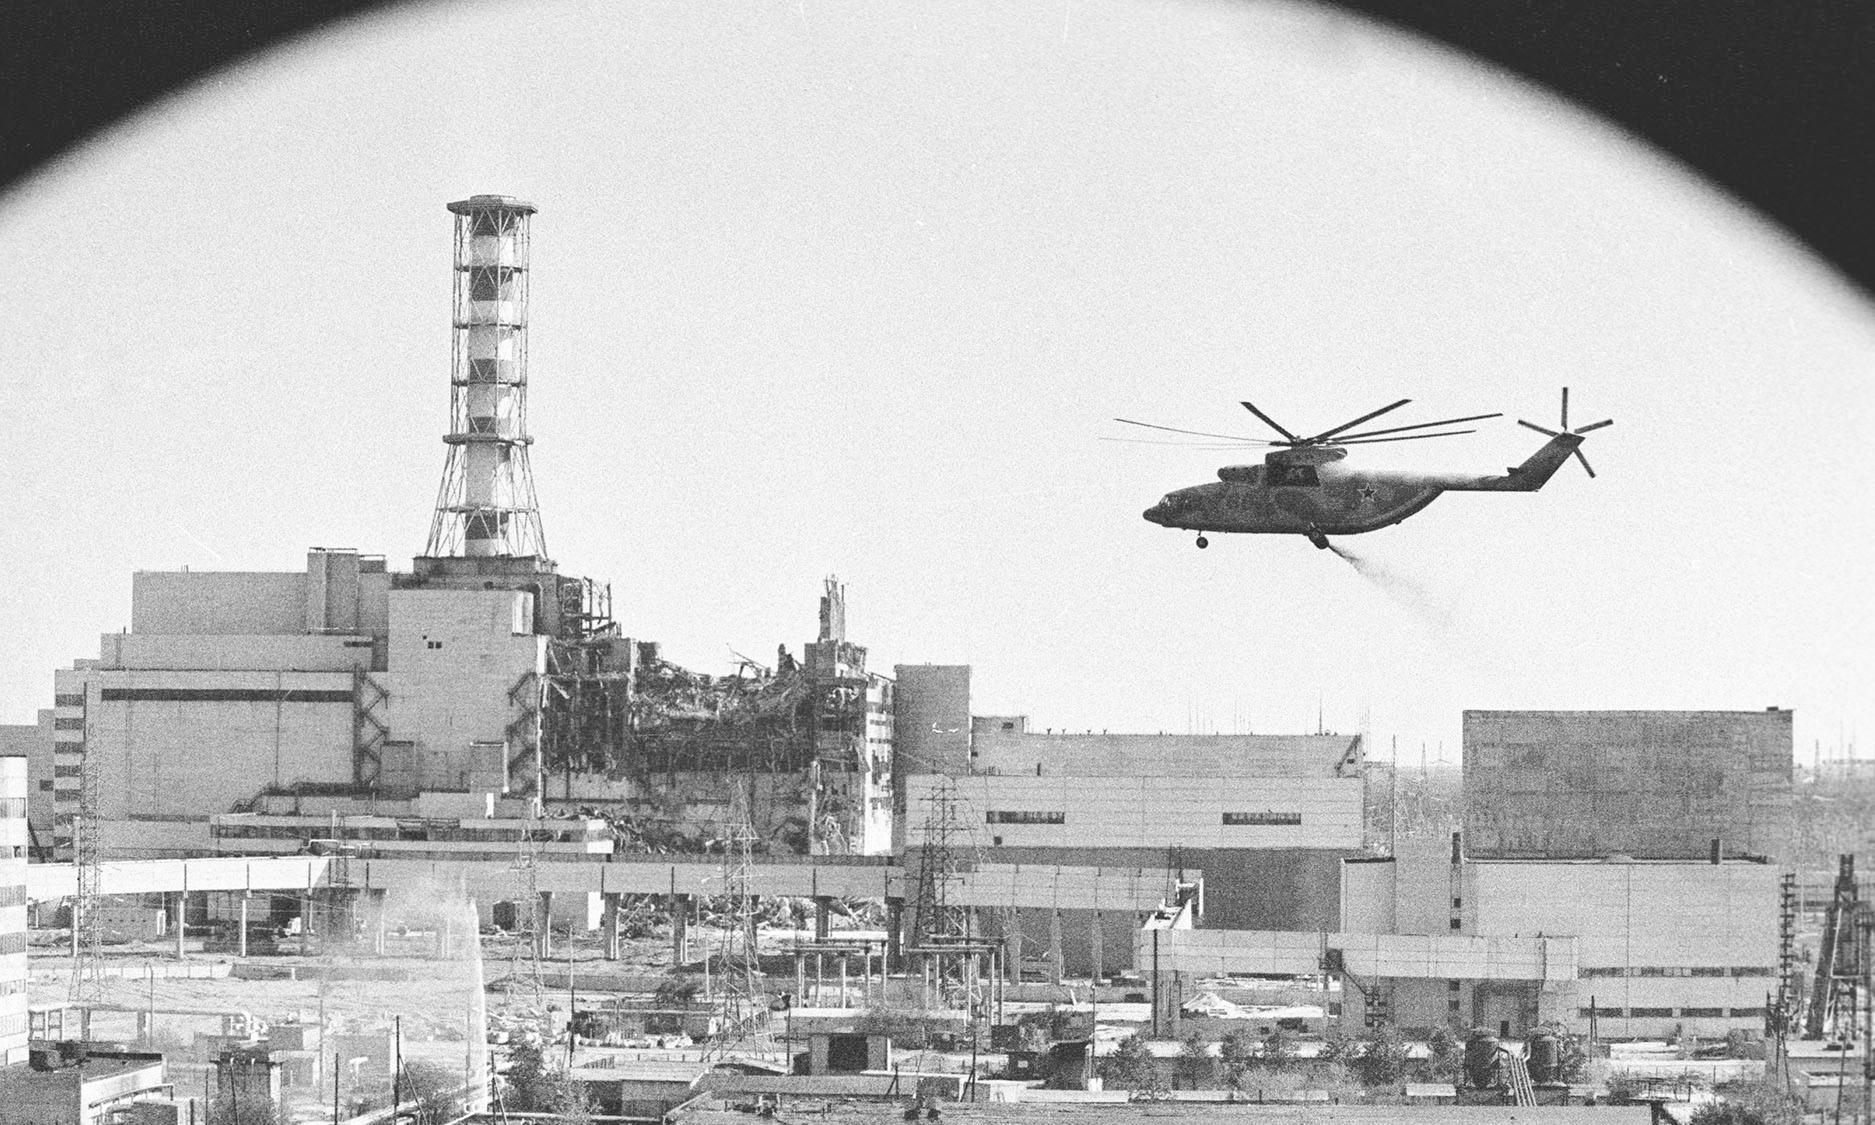 Cuba's generosity after Chernobyl